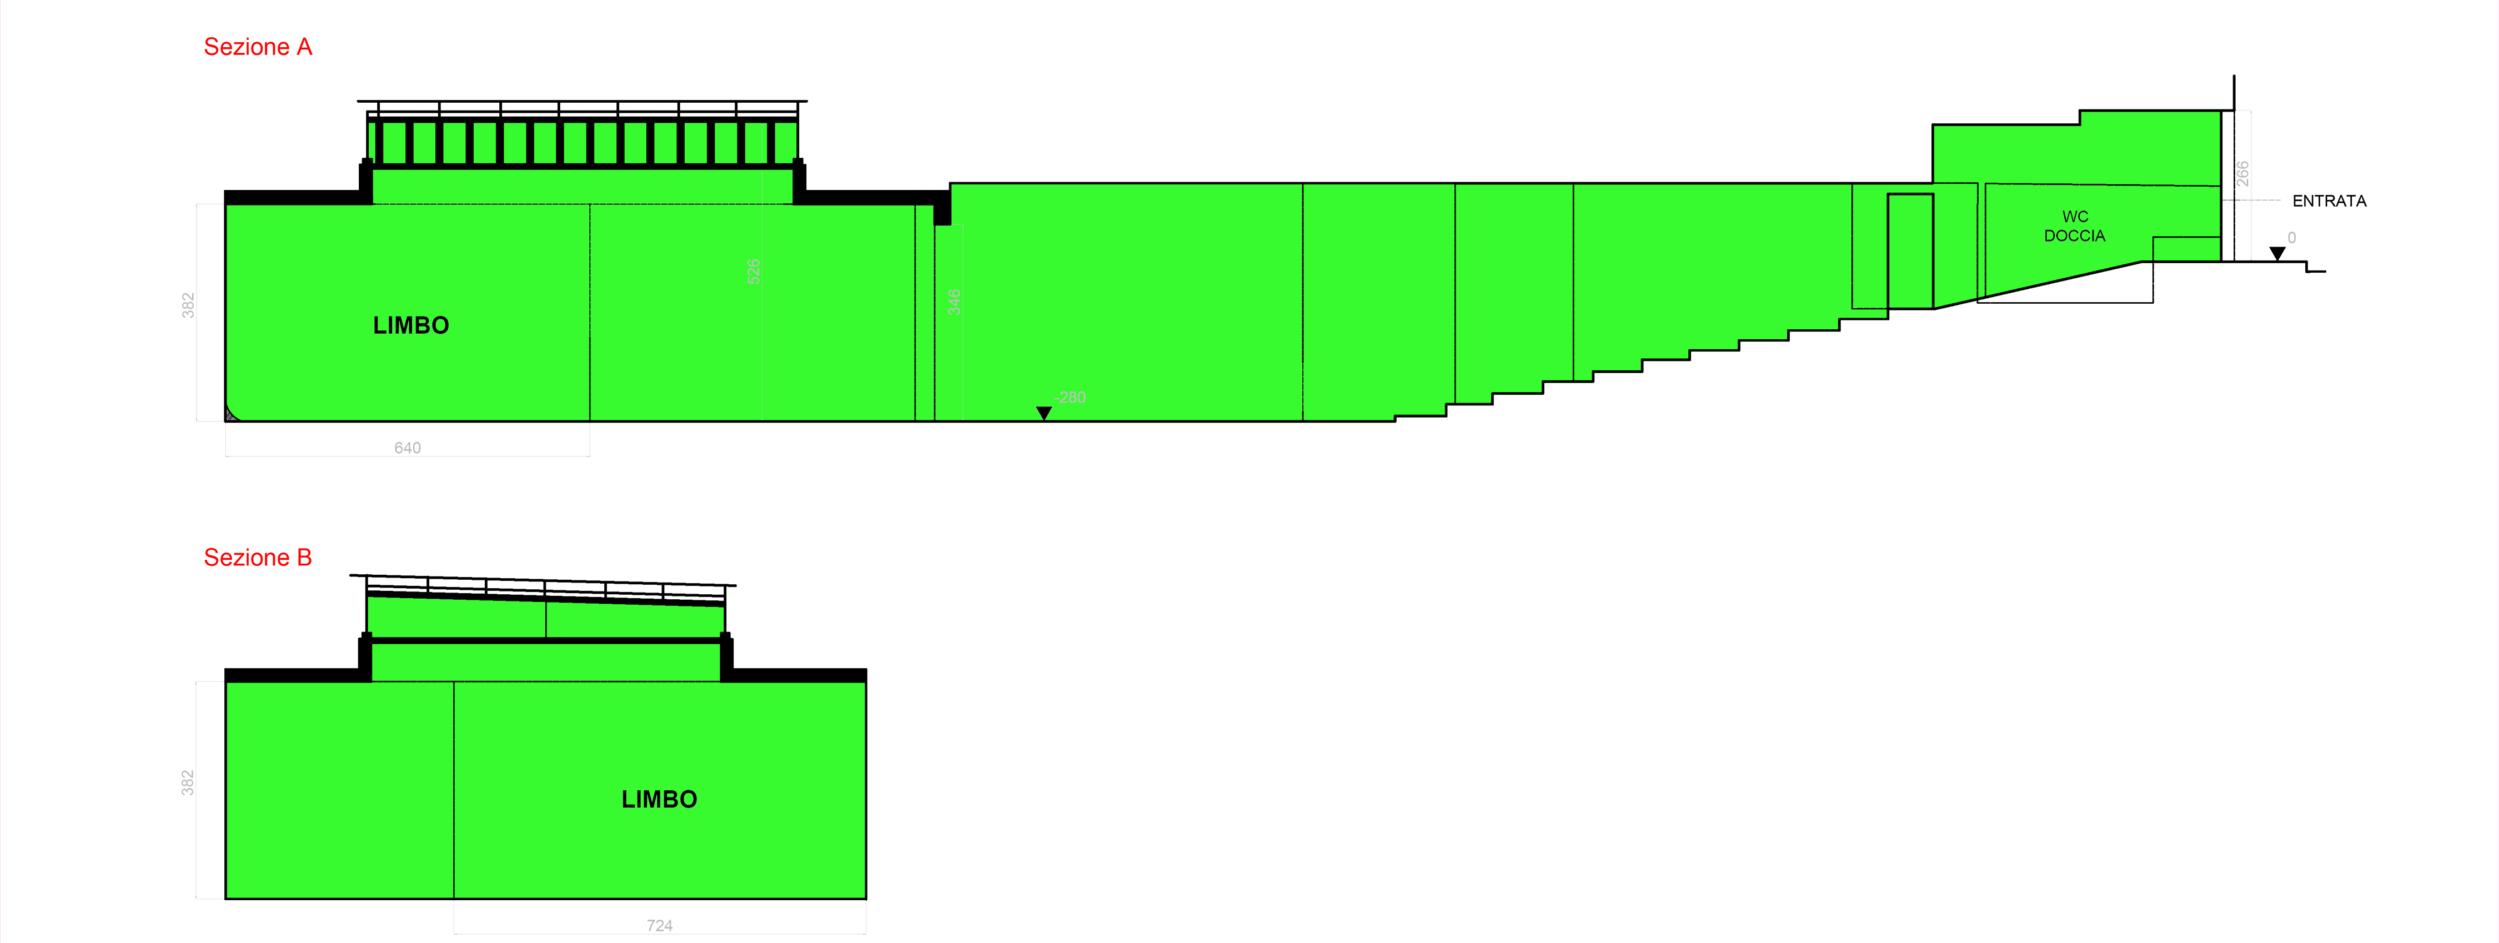 Sezioni